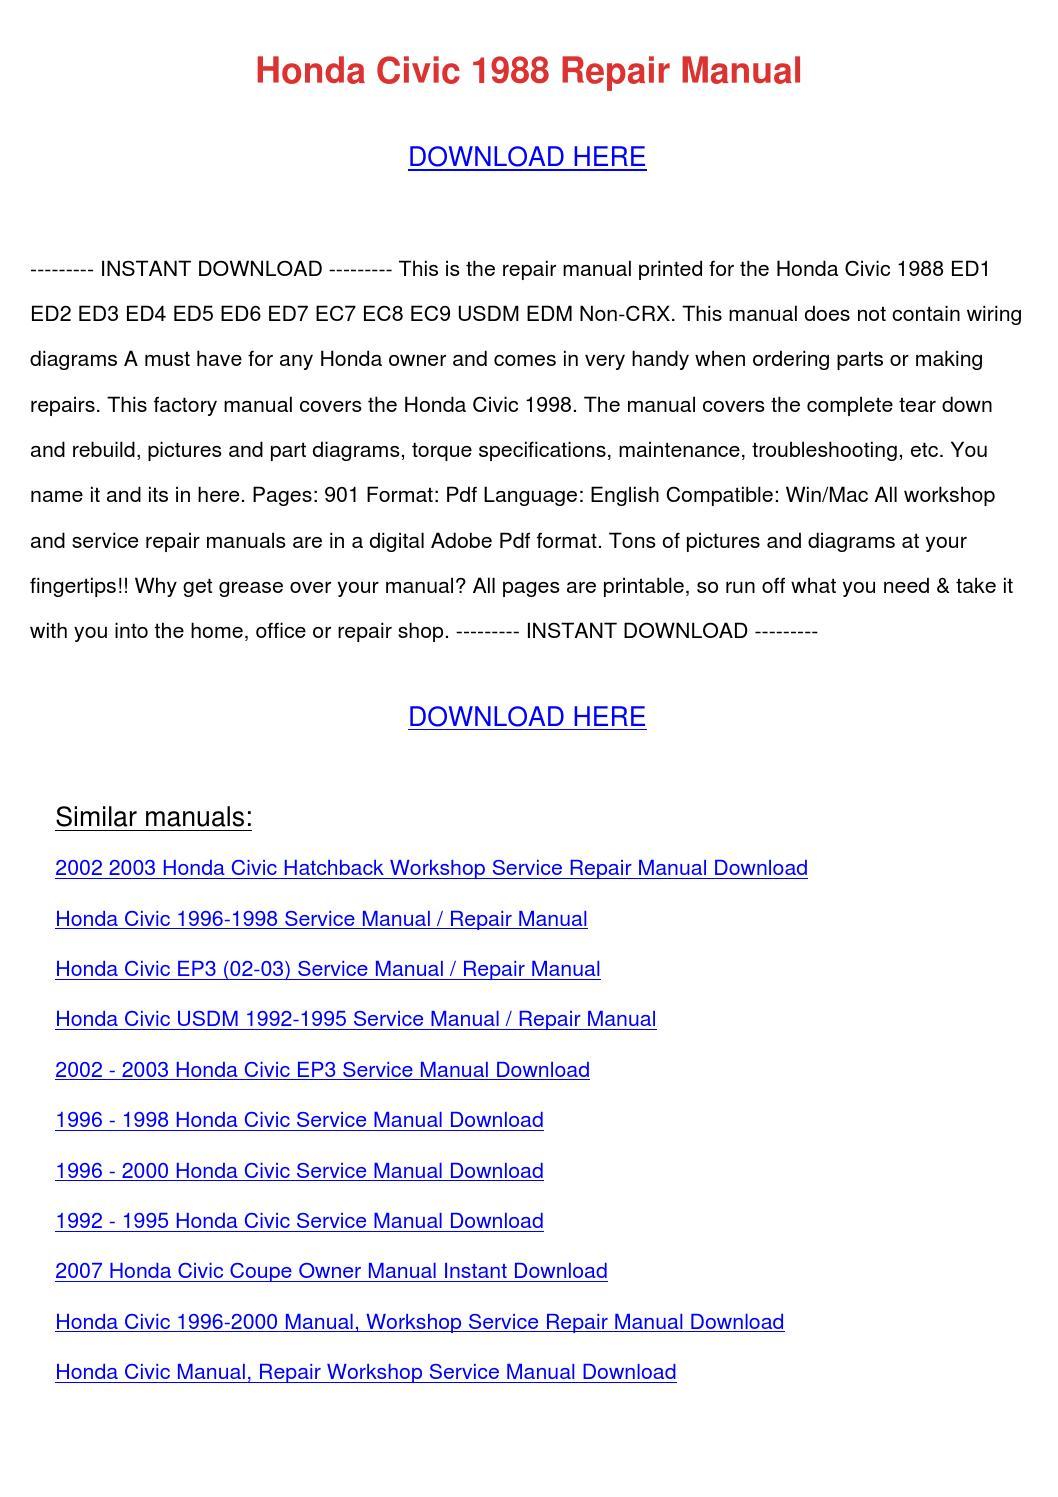 Honda Civic 1988 Repair Manual by HarleyFreeland - issuu